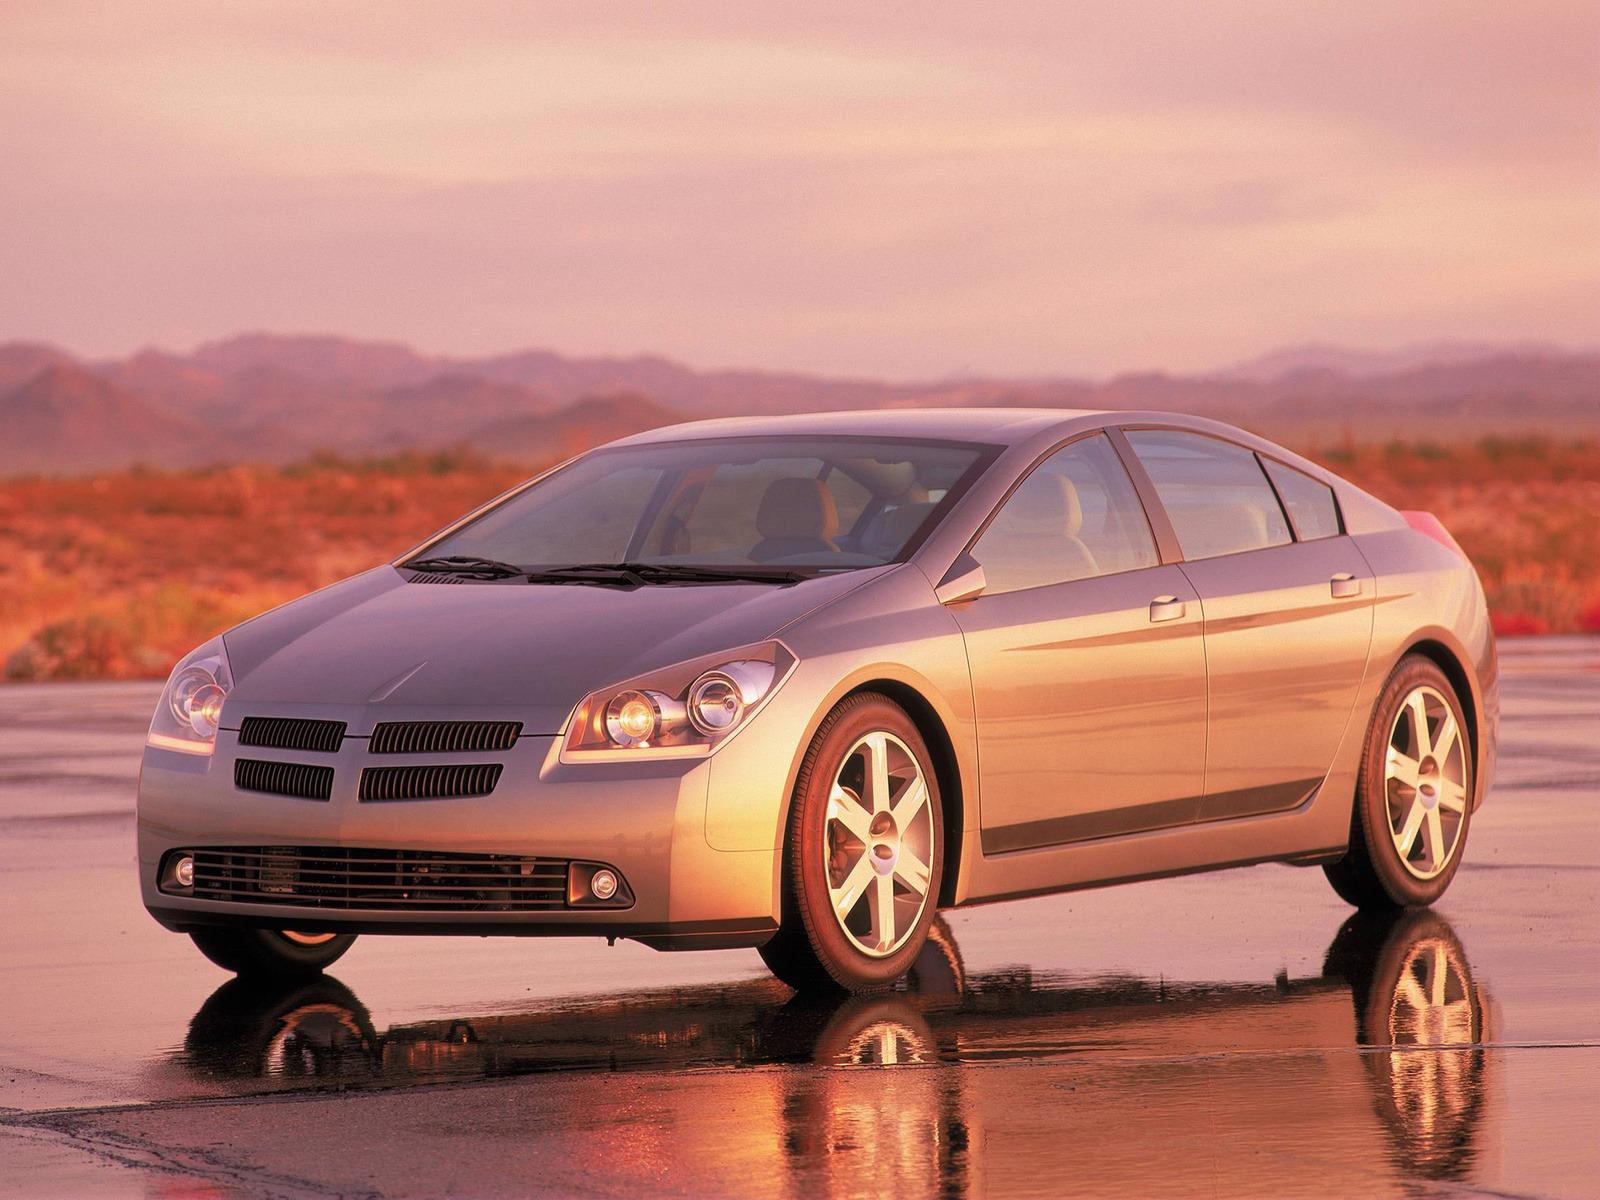 Hyundai Dealer Near Me >> Dodge Intrepid ESX3 Concept (2000) - Old Concept Cars